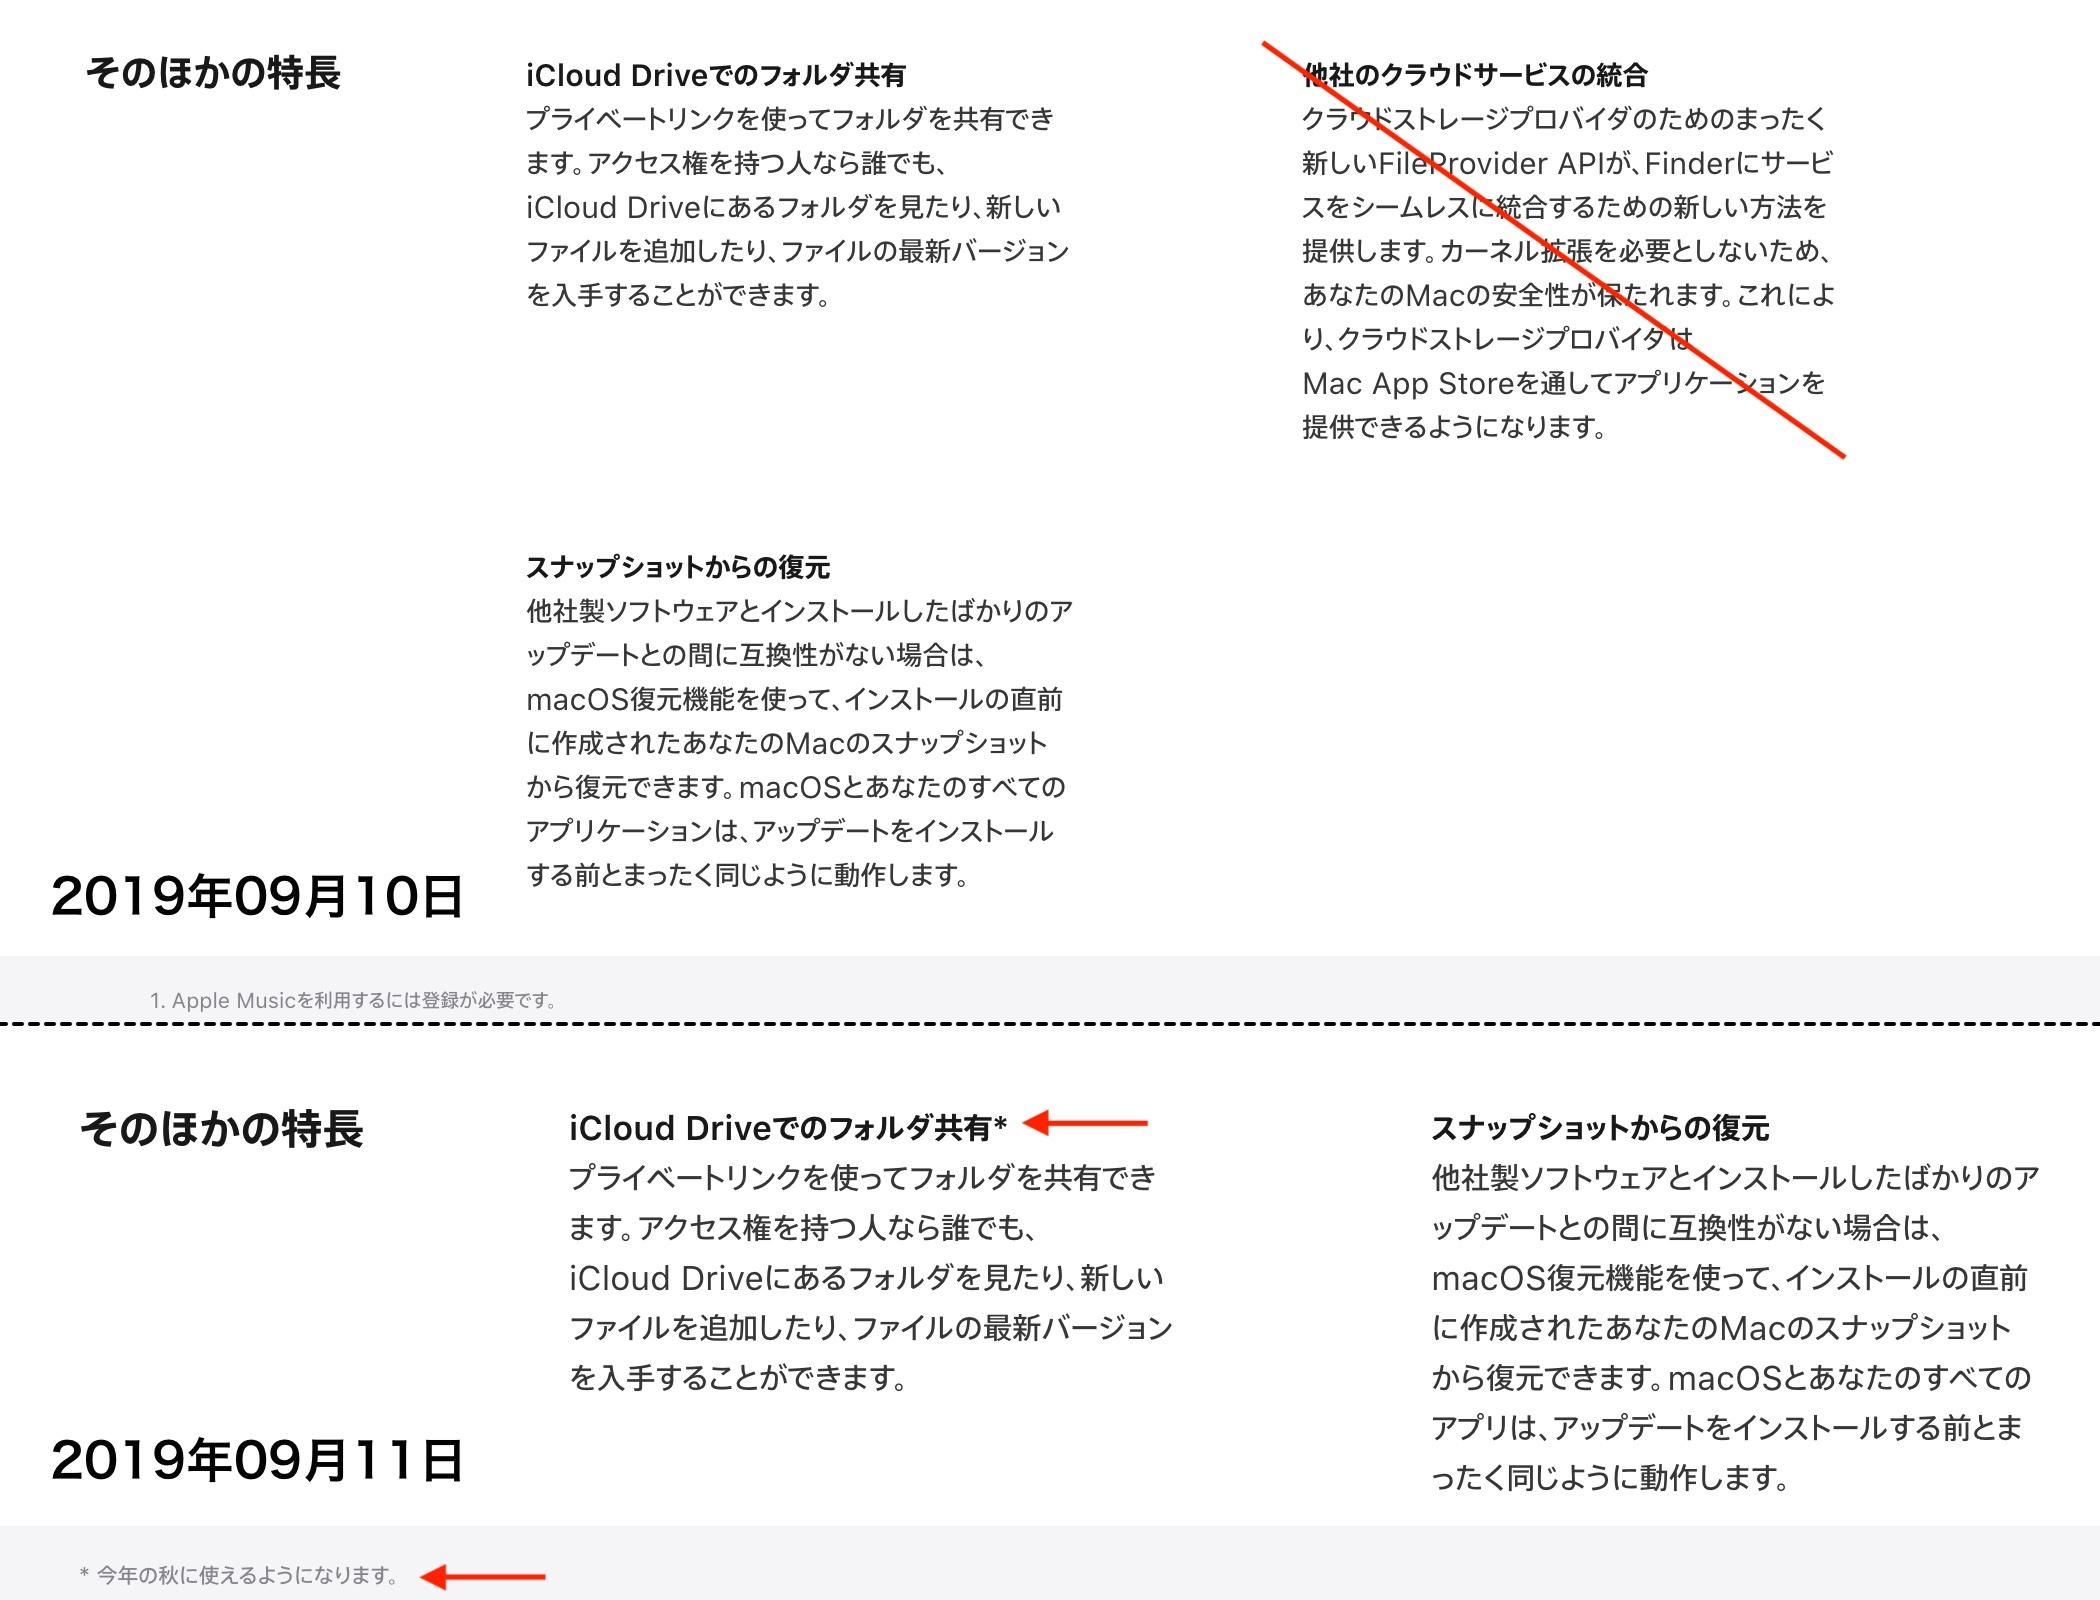 iCloud Drive folder sharingは2019年秋